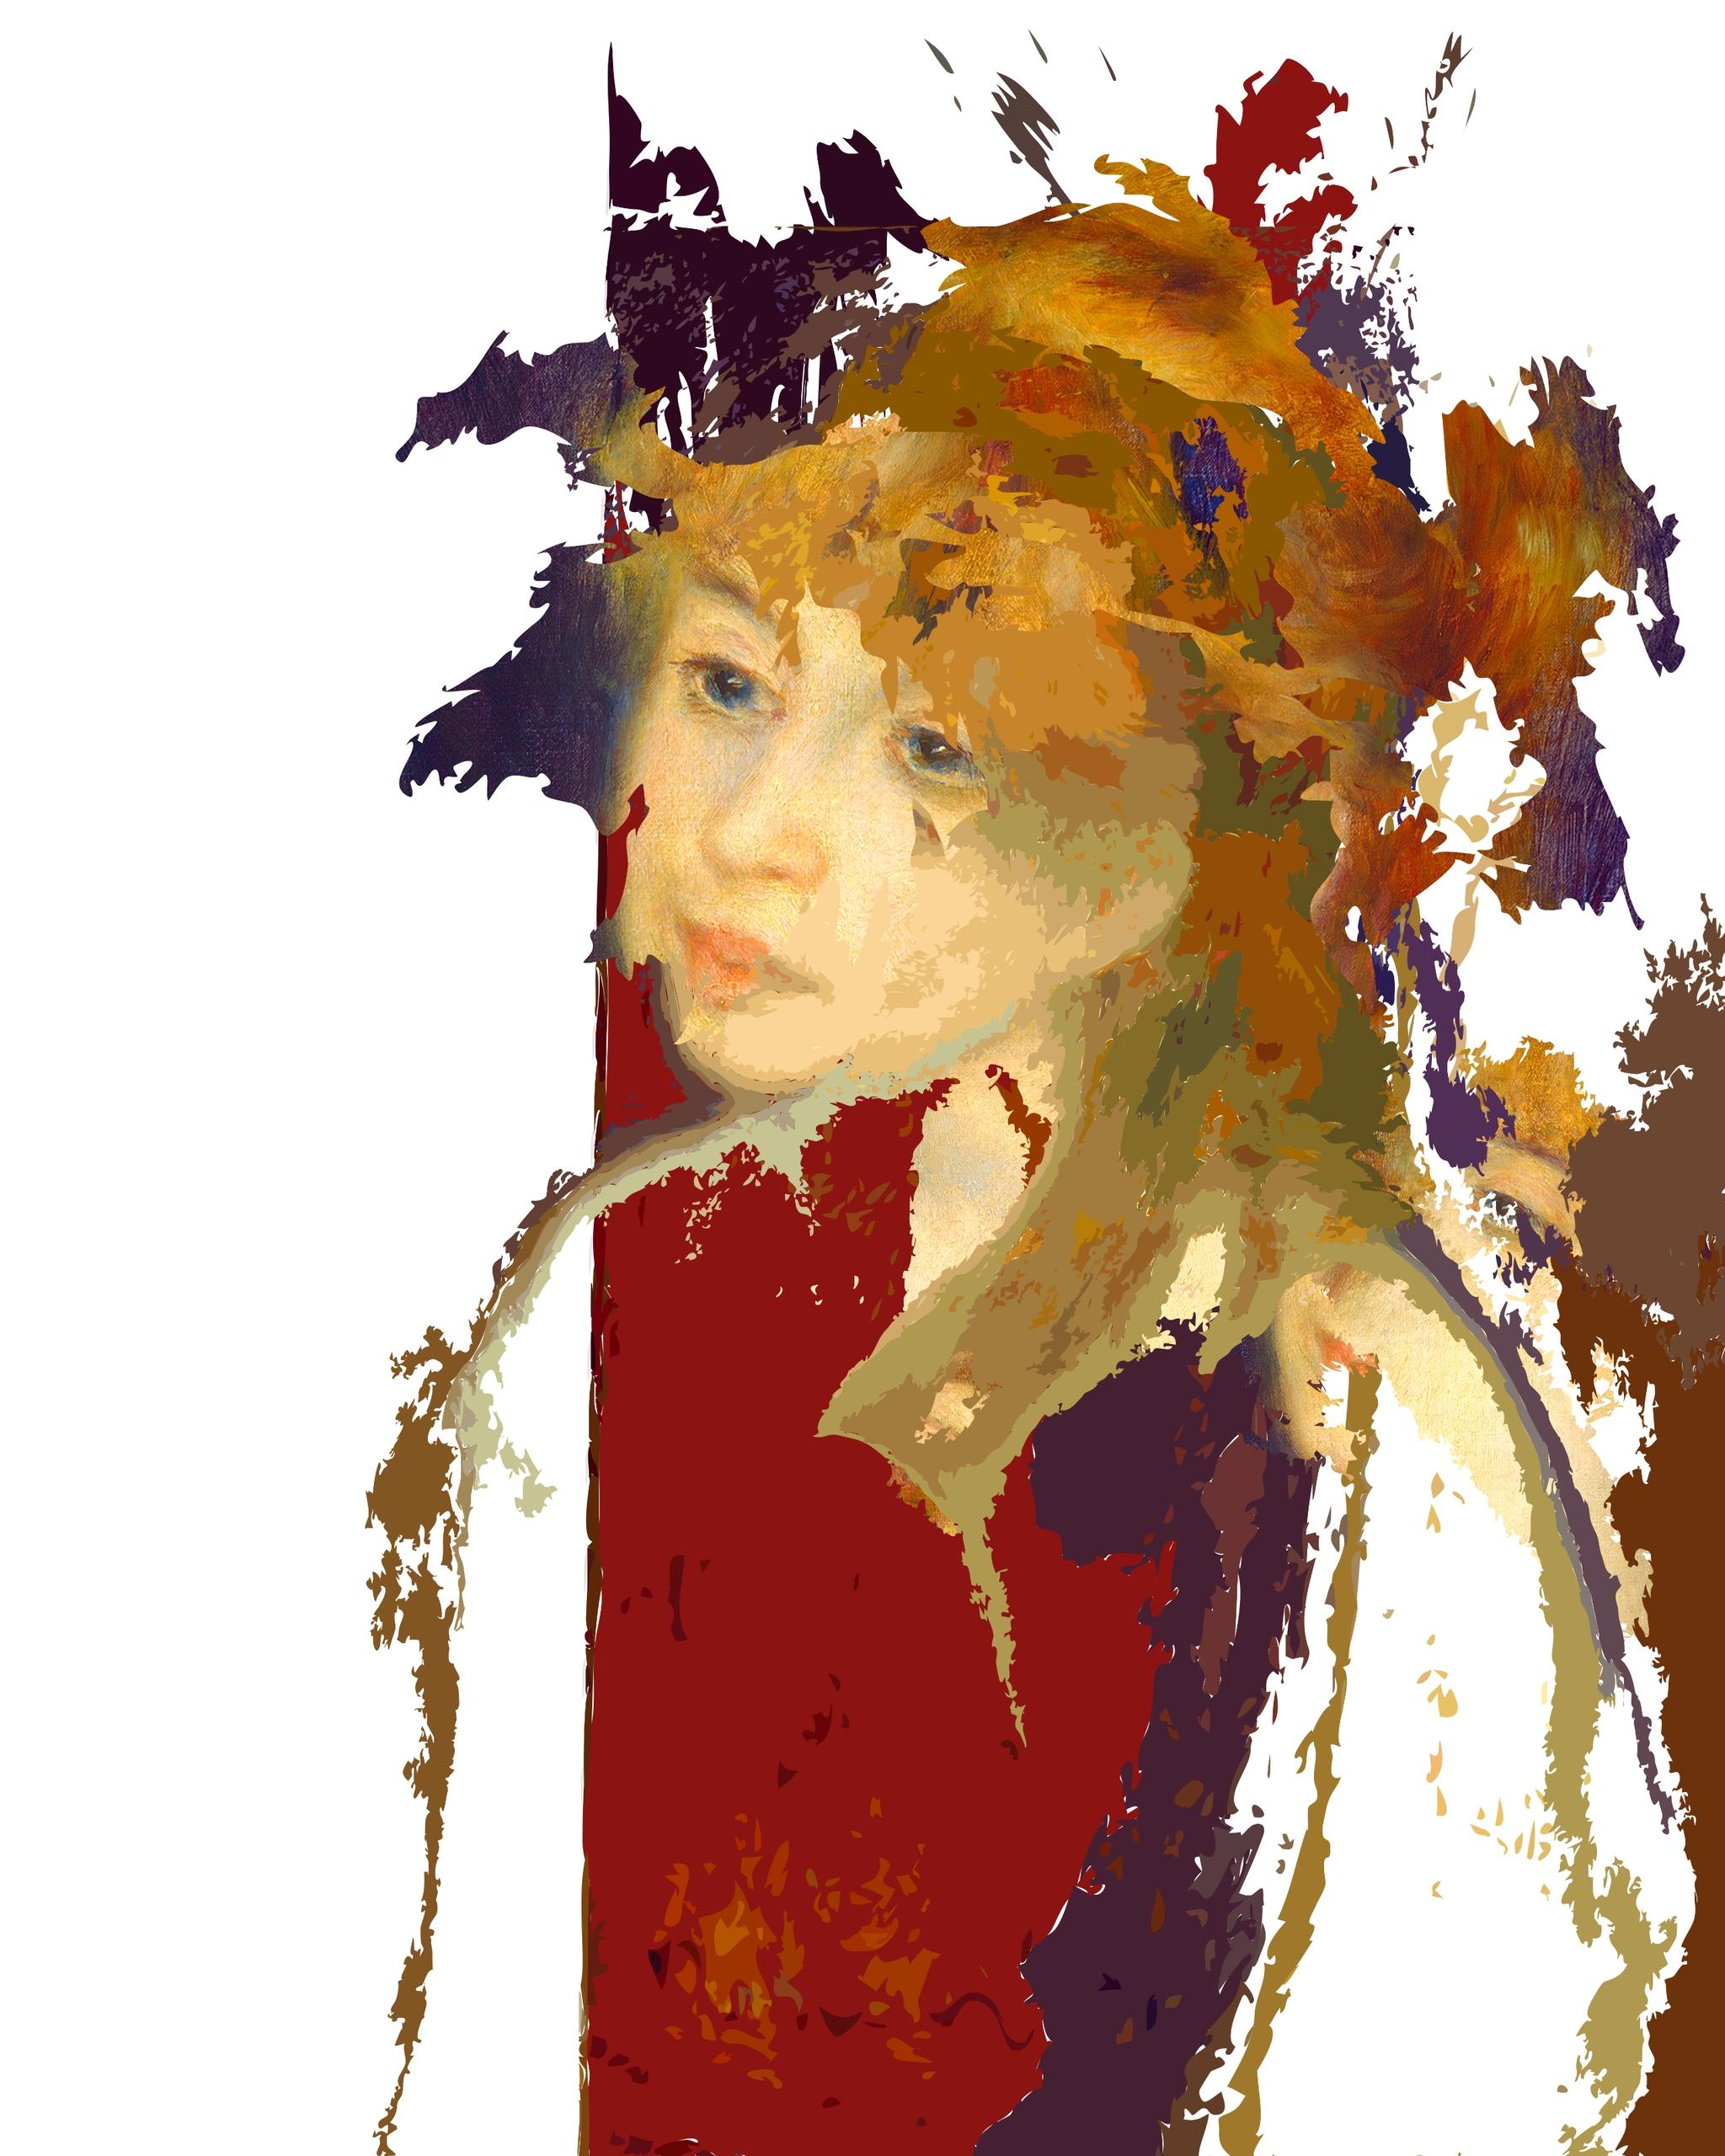 Renoir hack mess art. call vers - paulsmedberg | ello